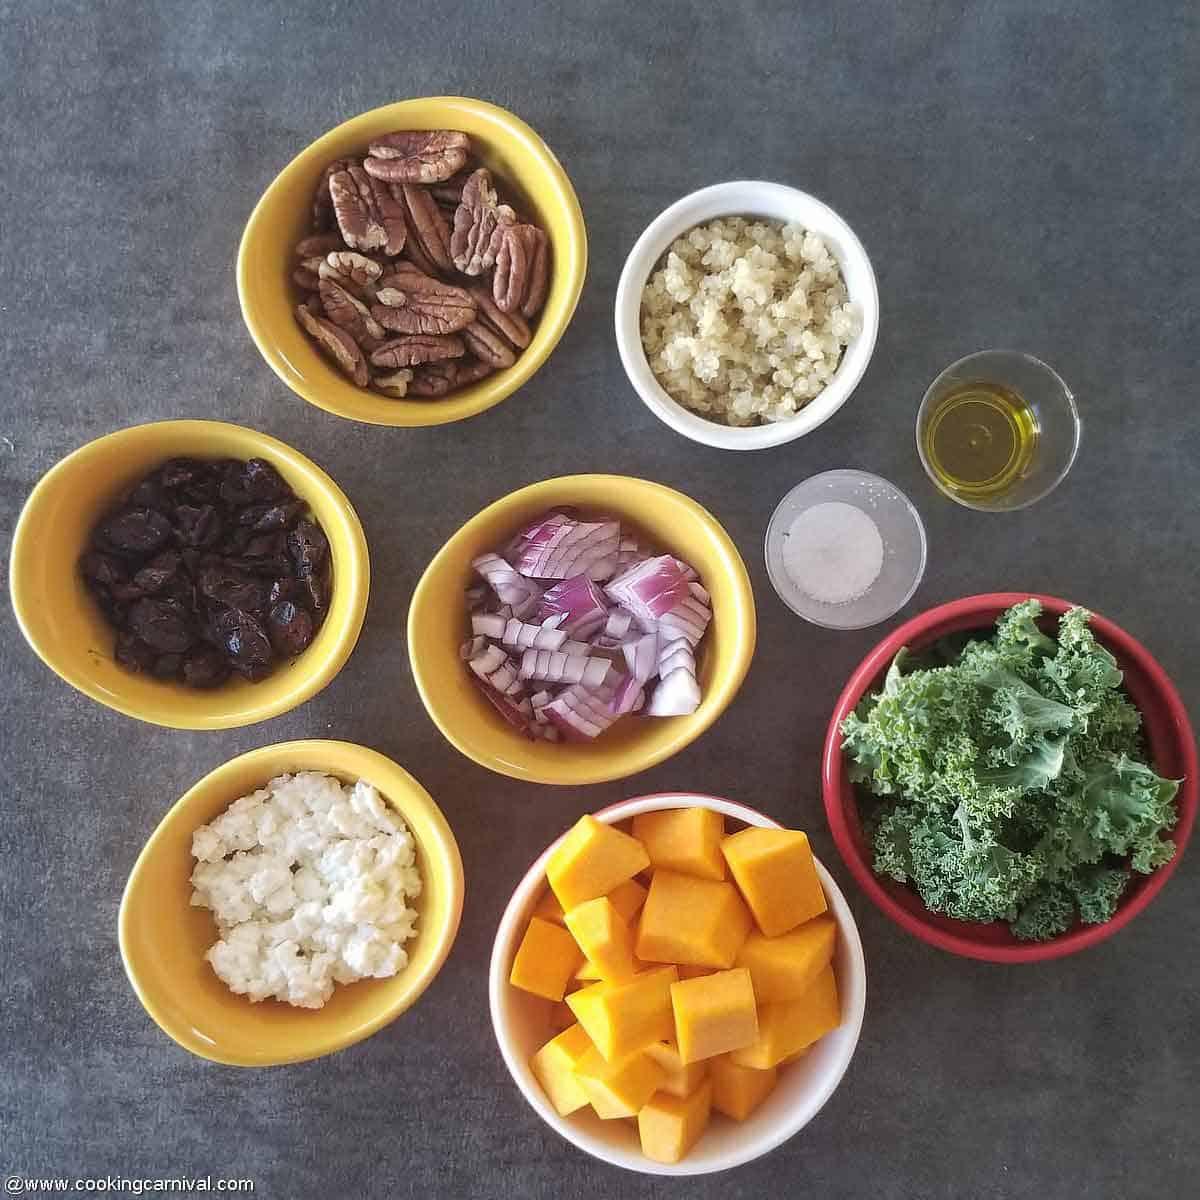 Roasted Butternut Squash Salad ingredients